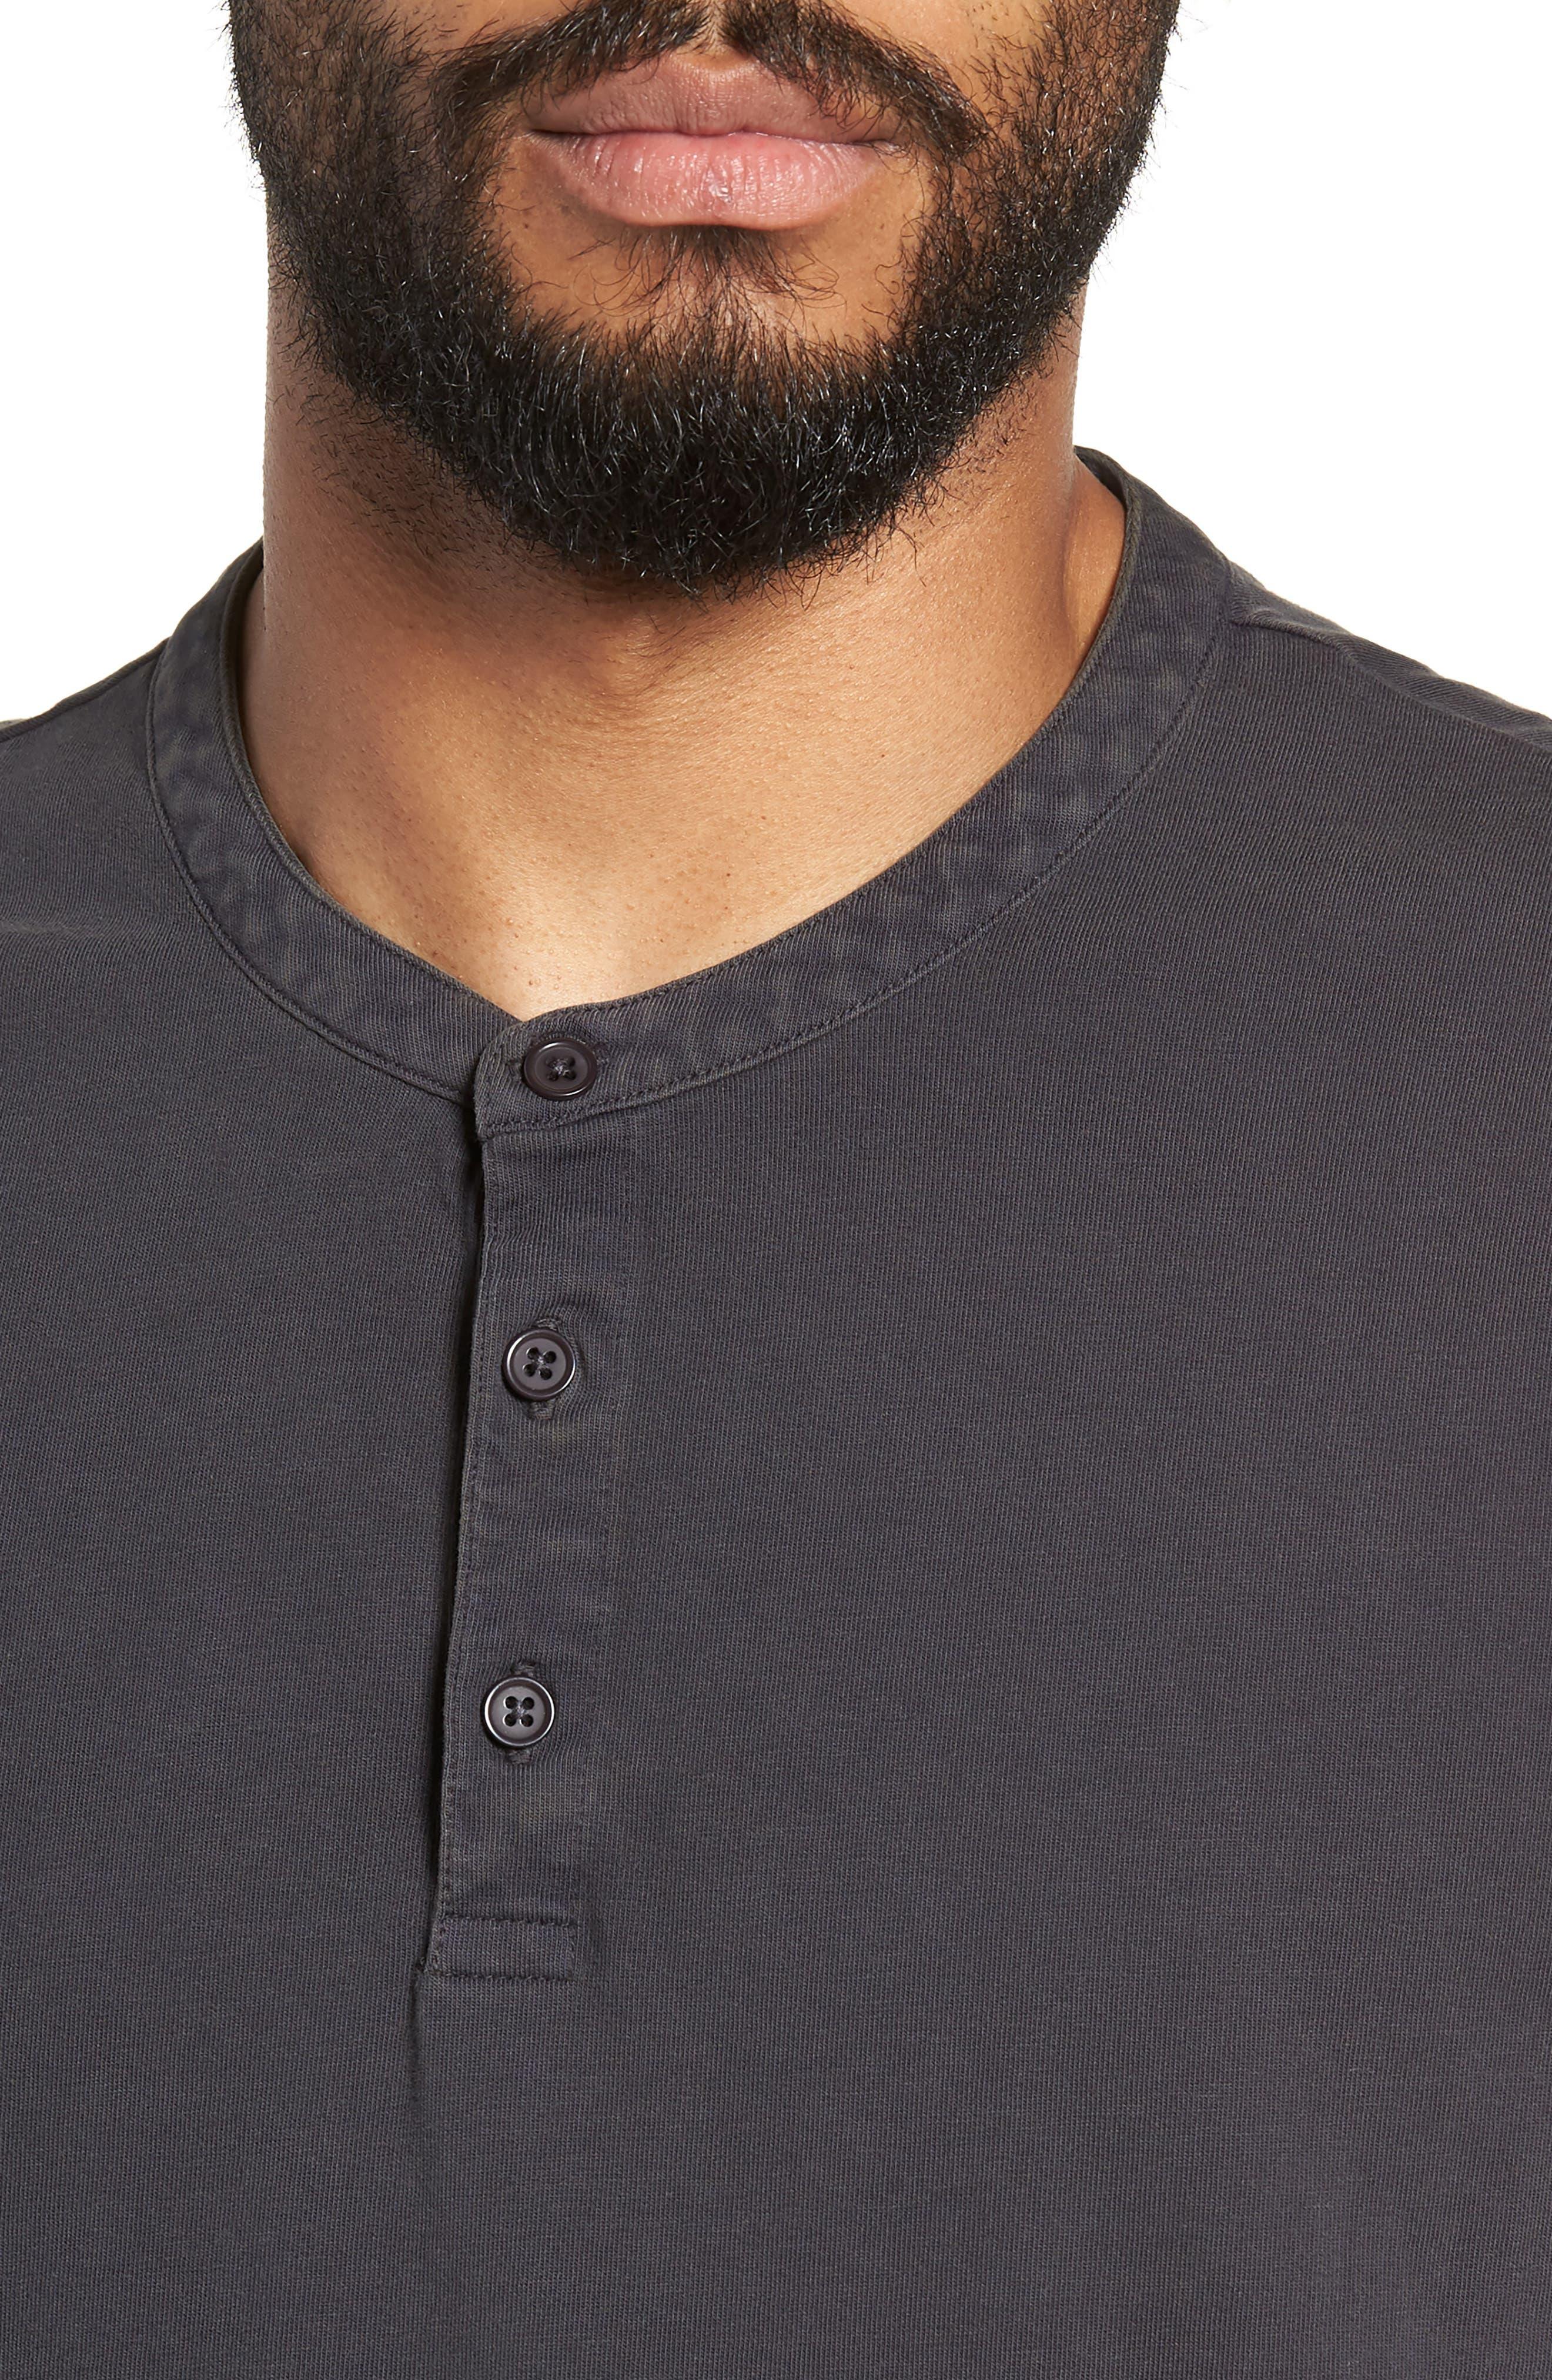 Regular Fit Garment Dye Short Sleeve Henley,                             Alternate thumbnail 4, color,                             WASHED BLACK